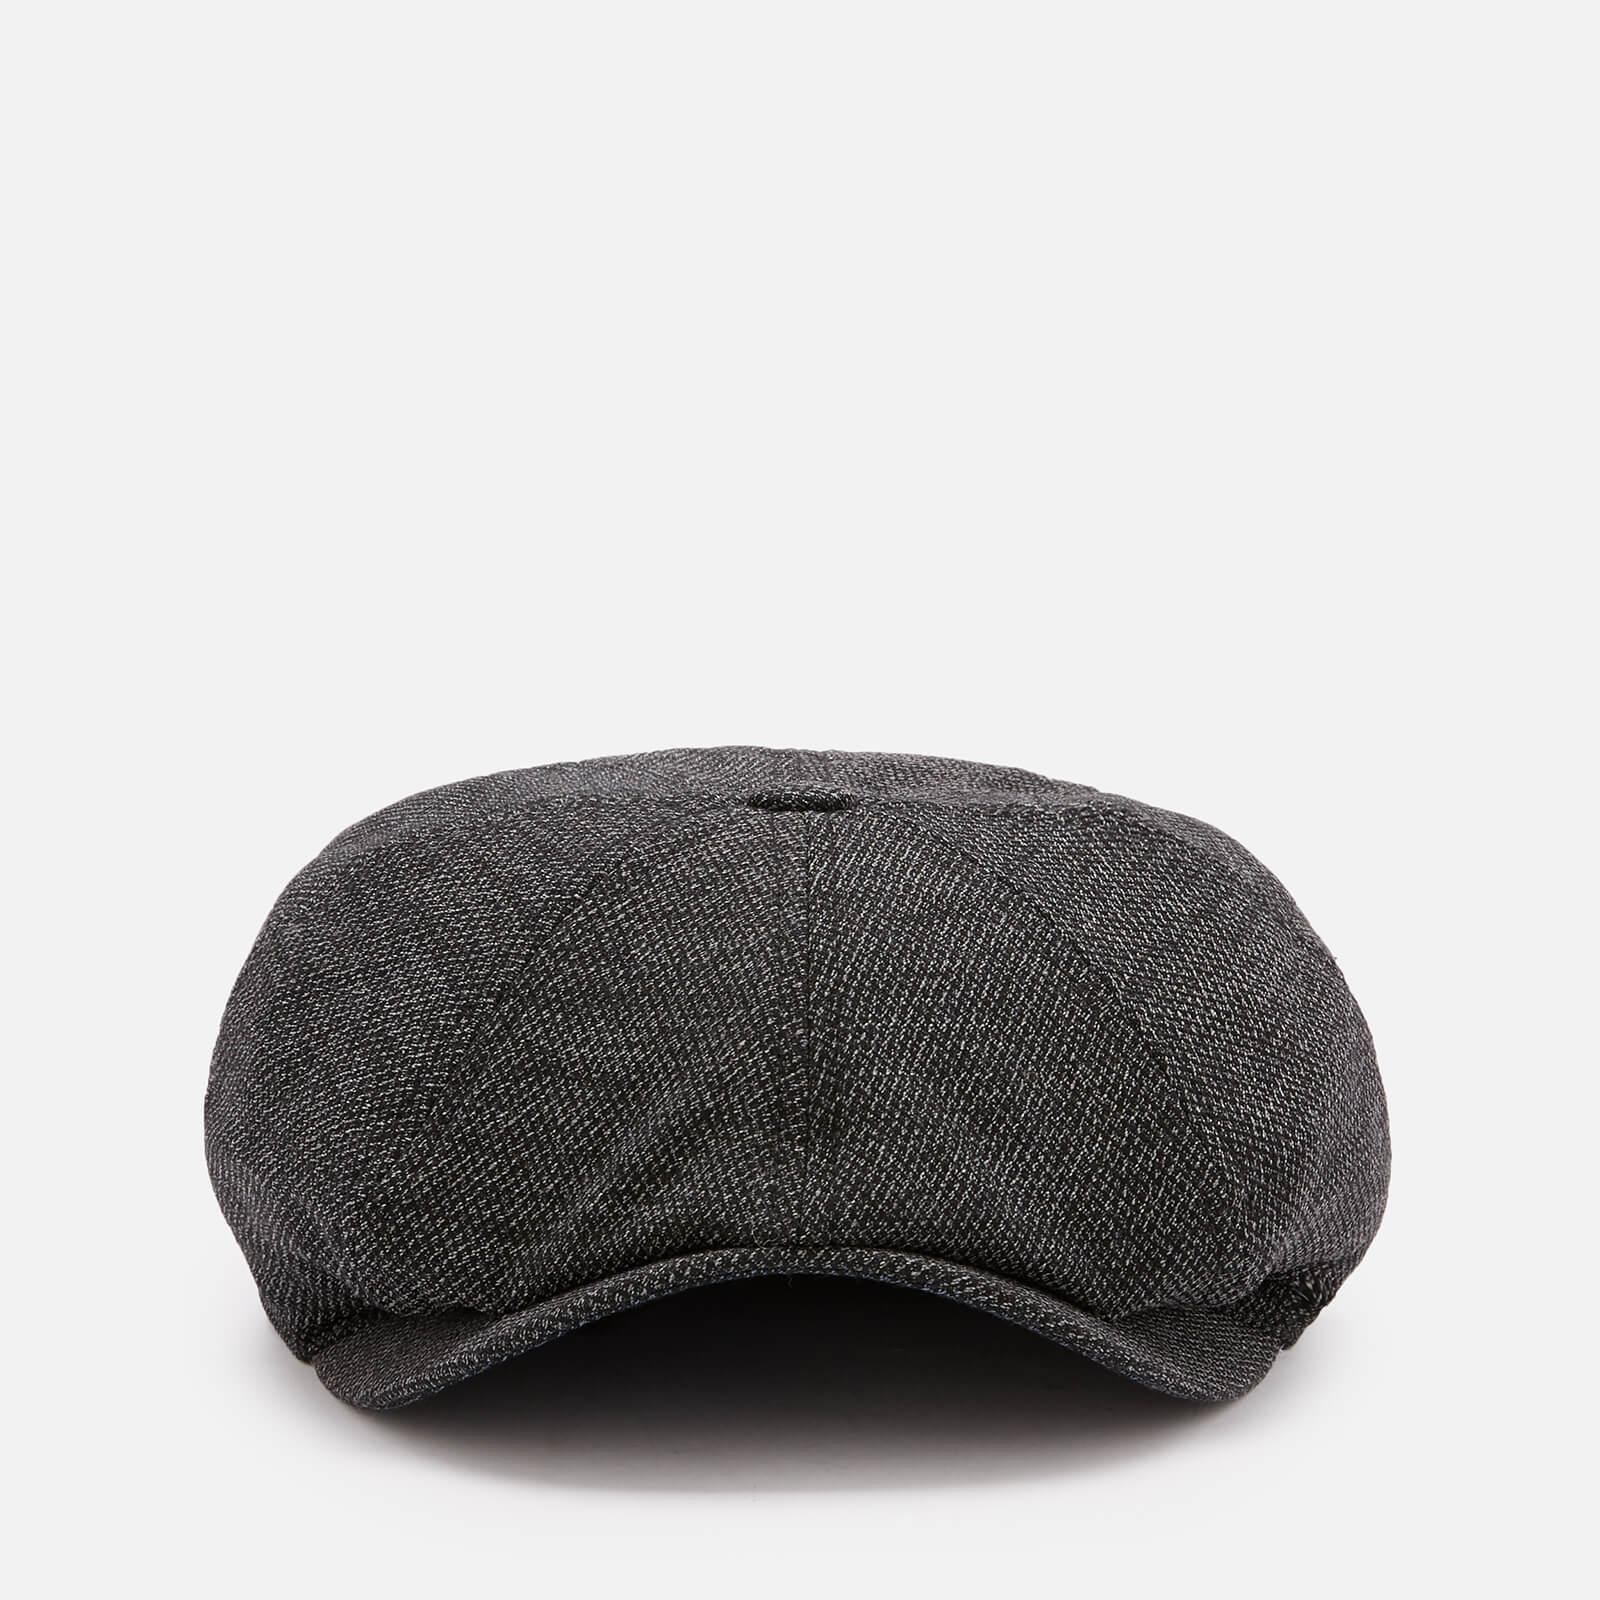 29633ae44b4 Lyst - Ted Baker Treacle Baker Boy Hat in Gray for Men